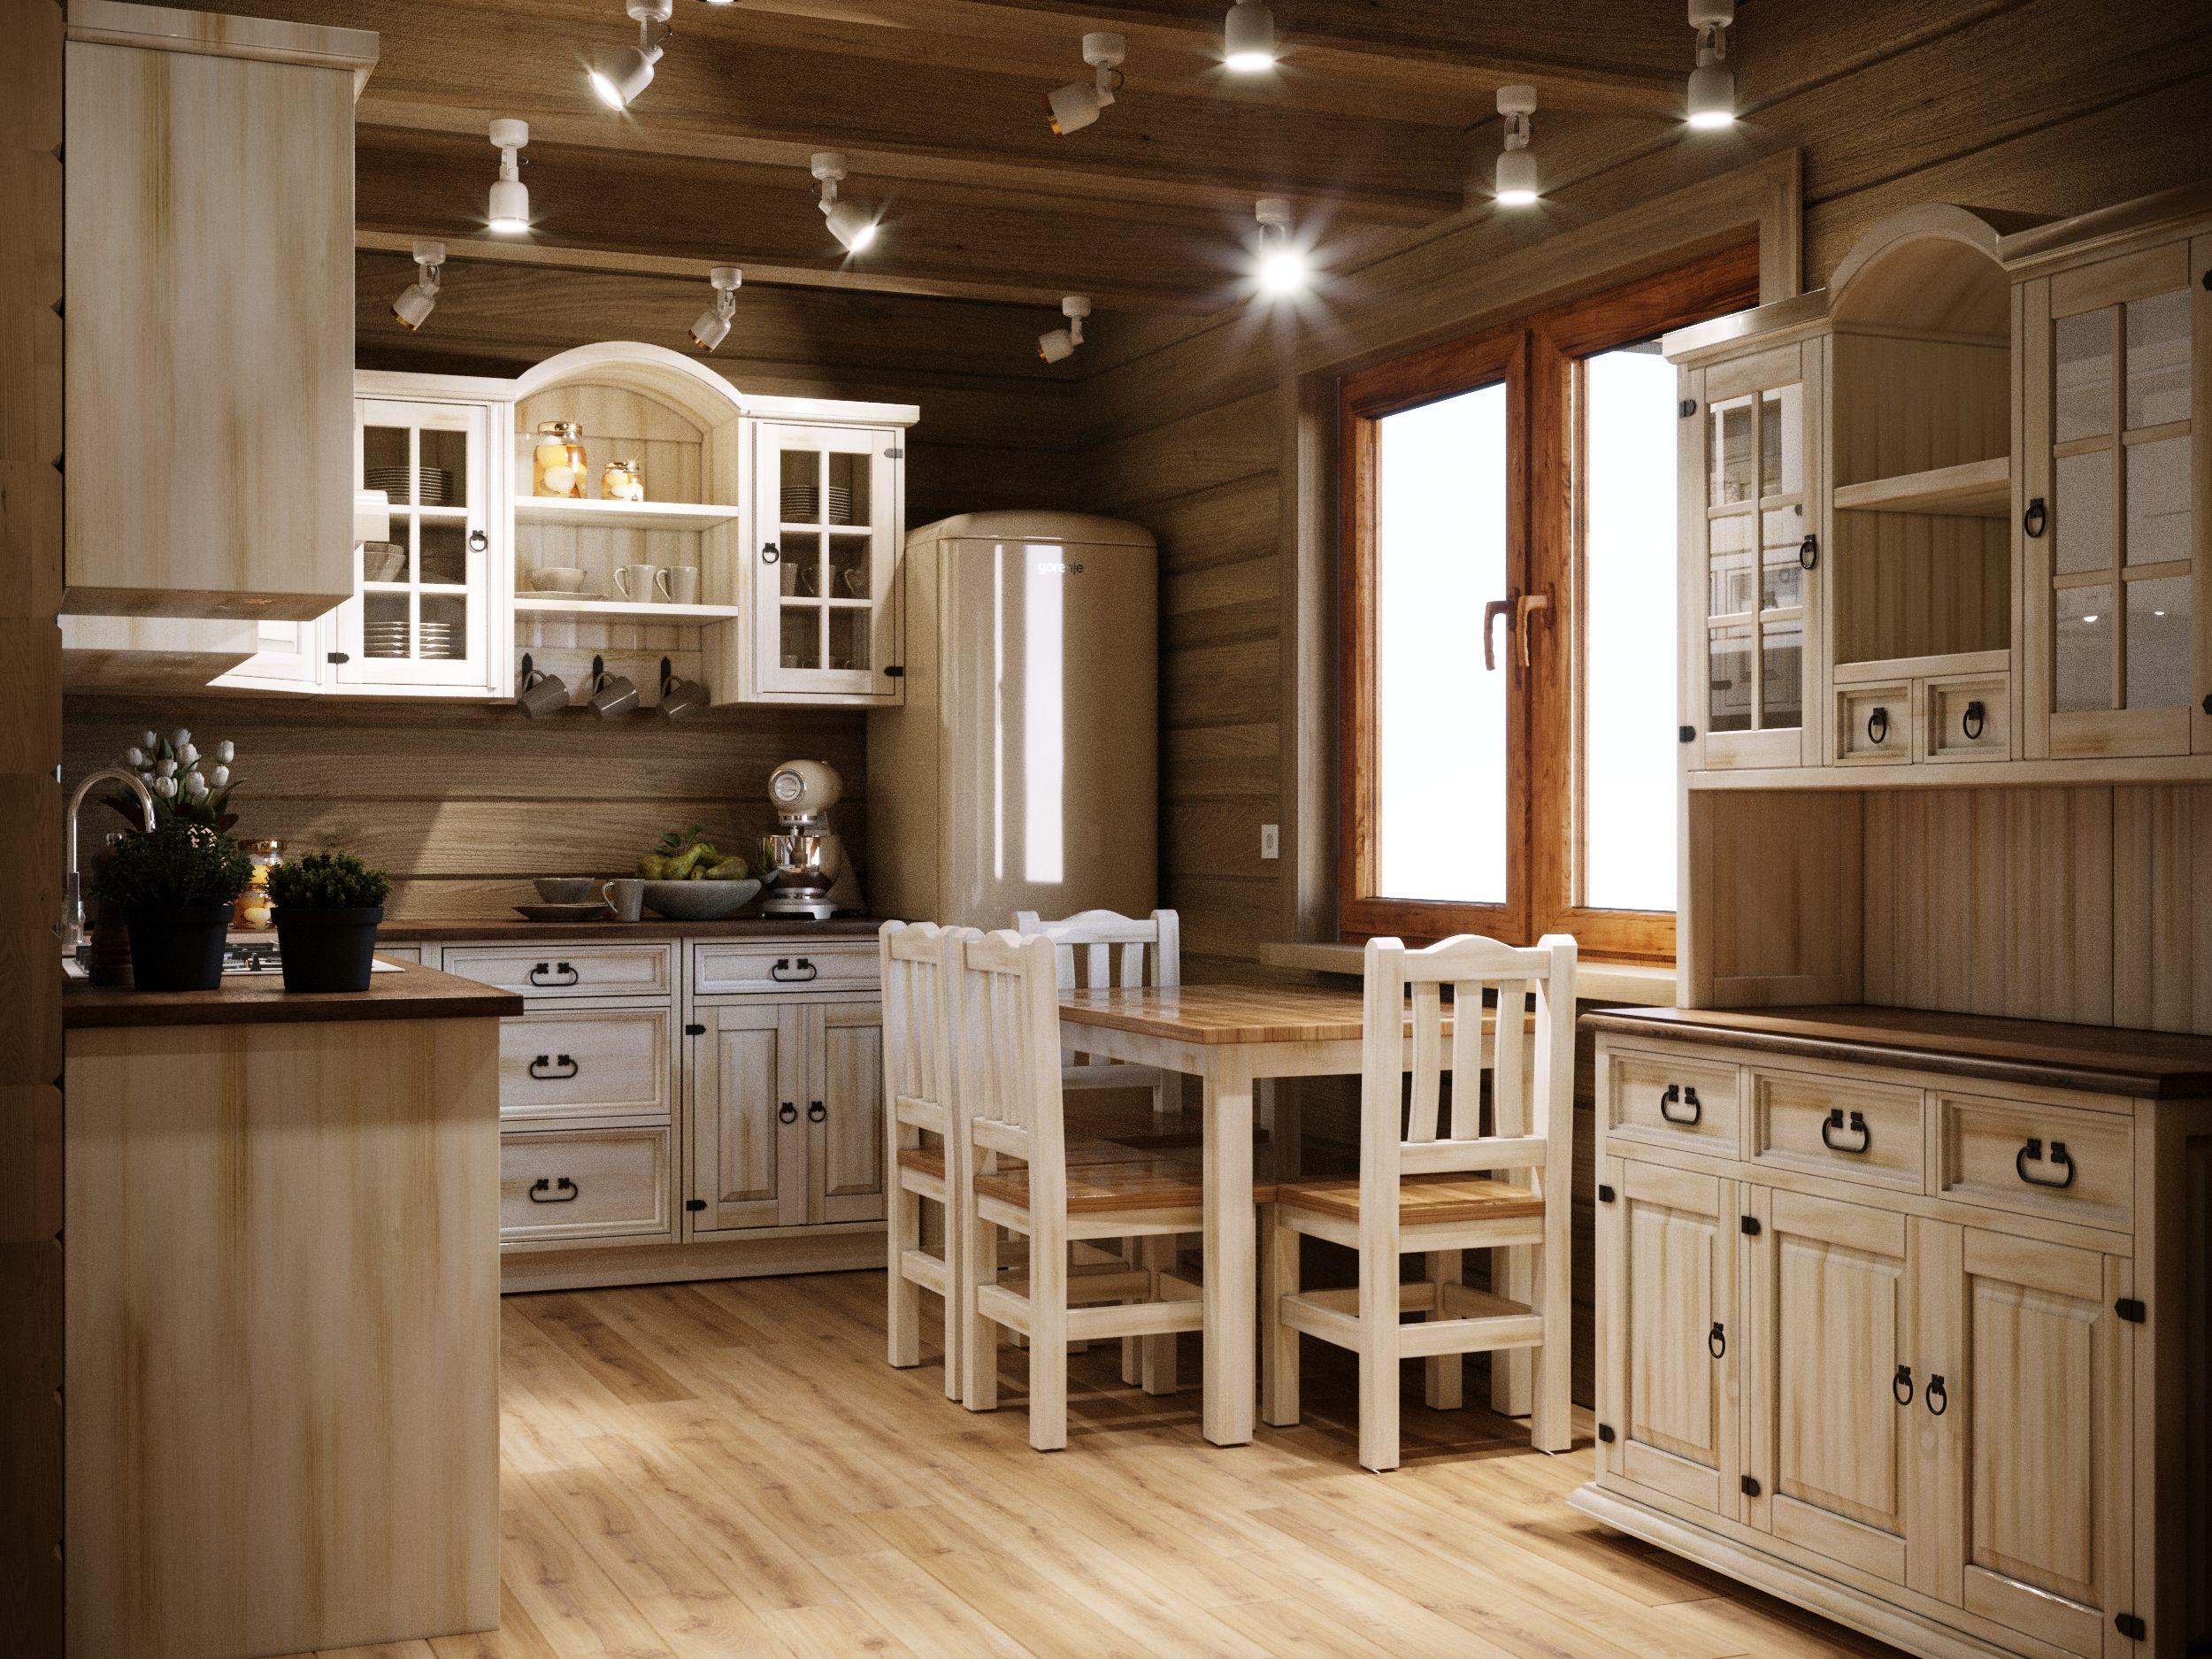 Drewniana Kuchnia Modulowa Wnetrze Kitchen Provence Style Home